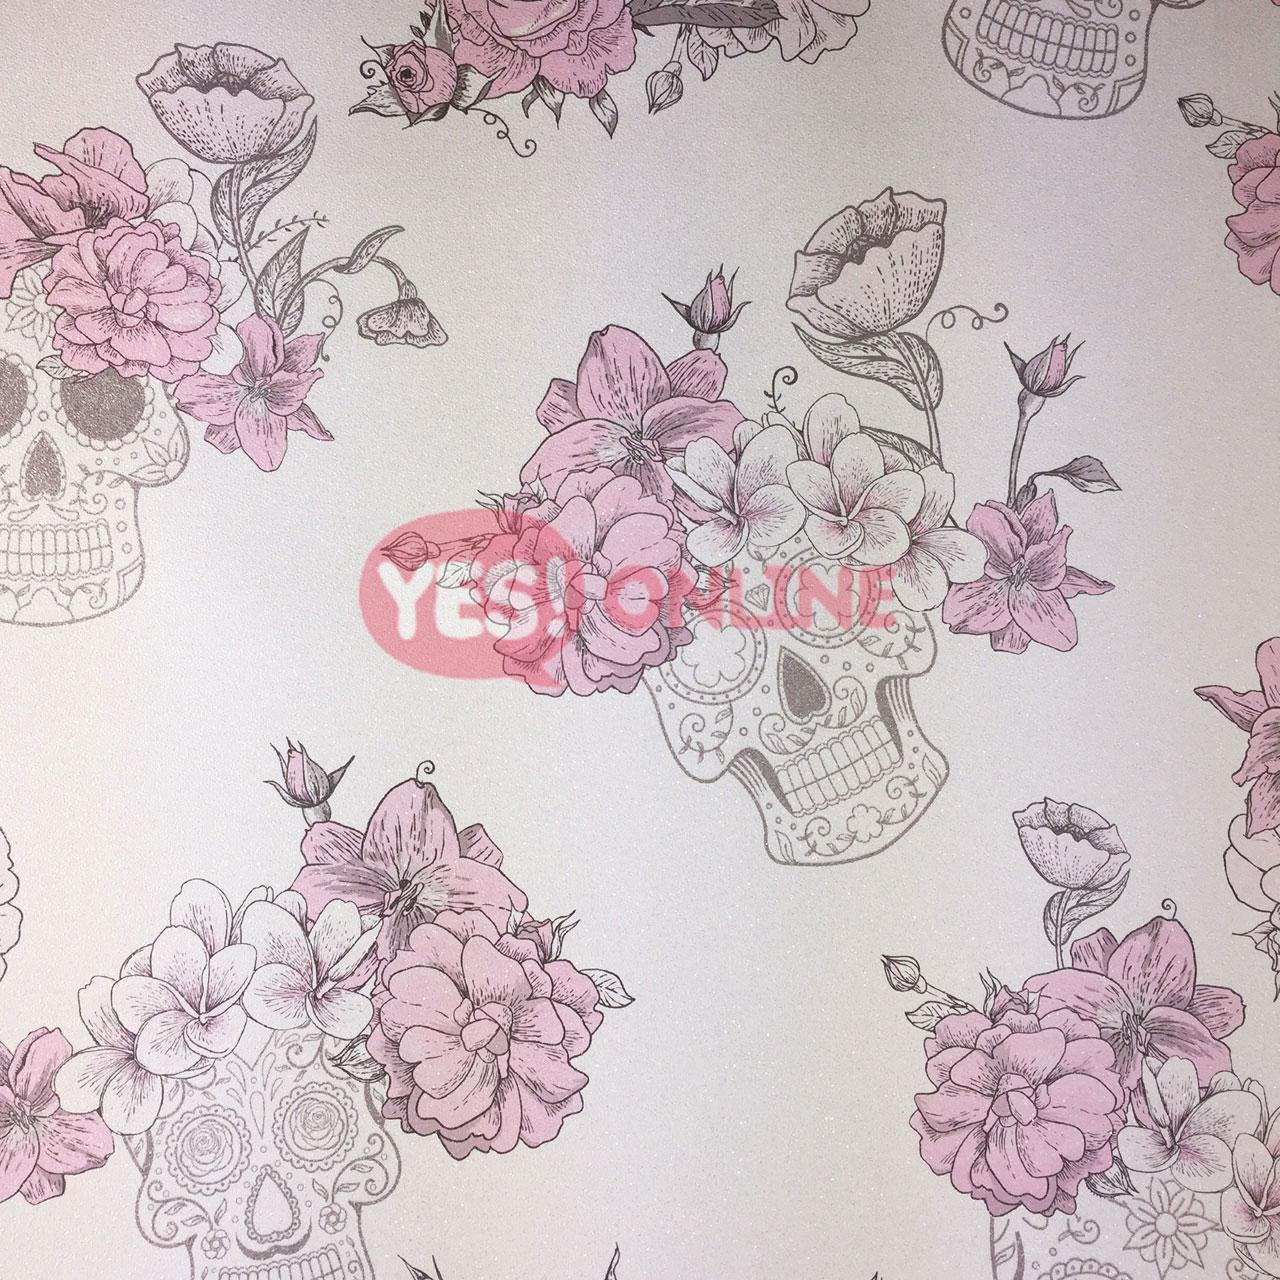 Roses Skulls Flower Floral Glitter Textured Wallpaper Pink Grey